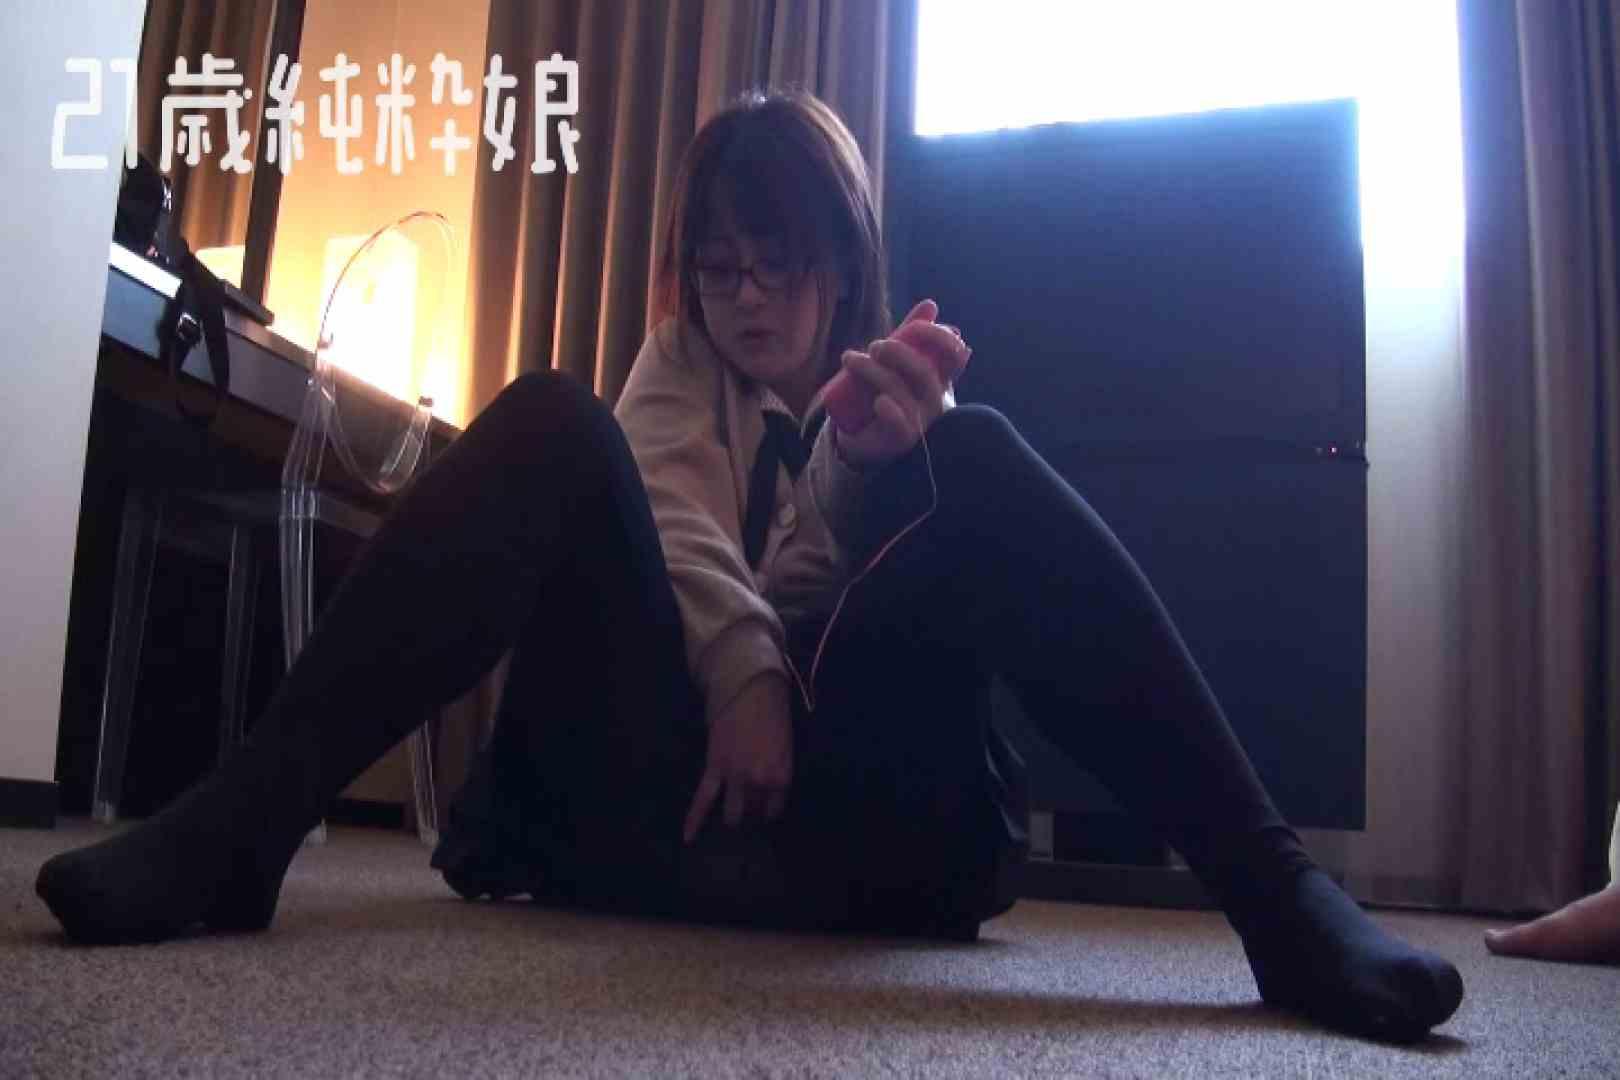 Gカップ21歳純粋嬢第2弾Vol.3 一般投稿 オマンコ動画キャプチャ 50pic 5